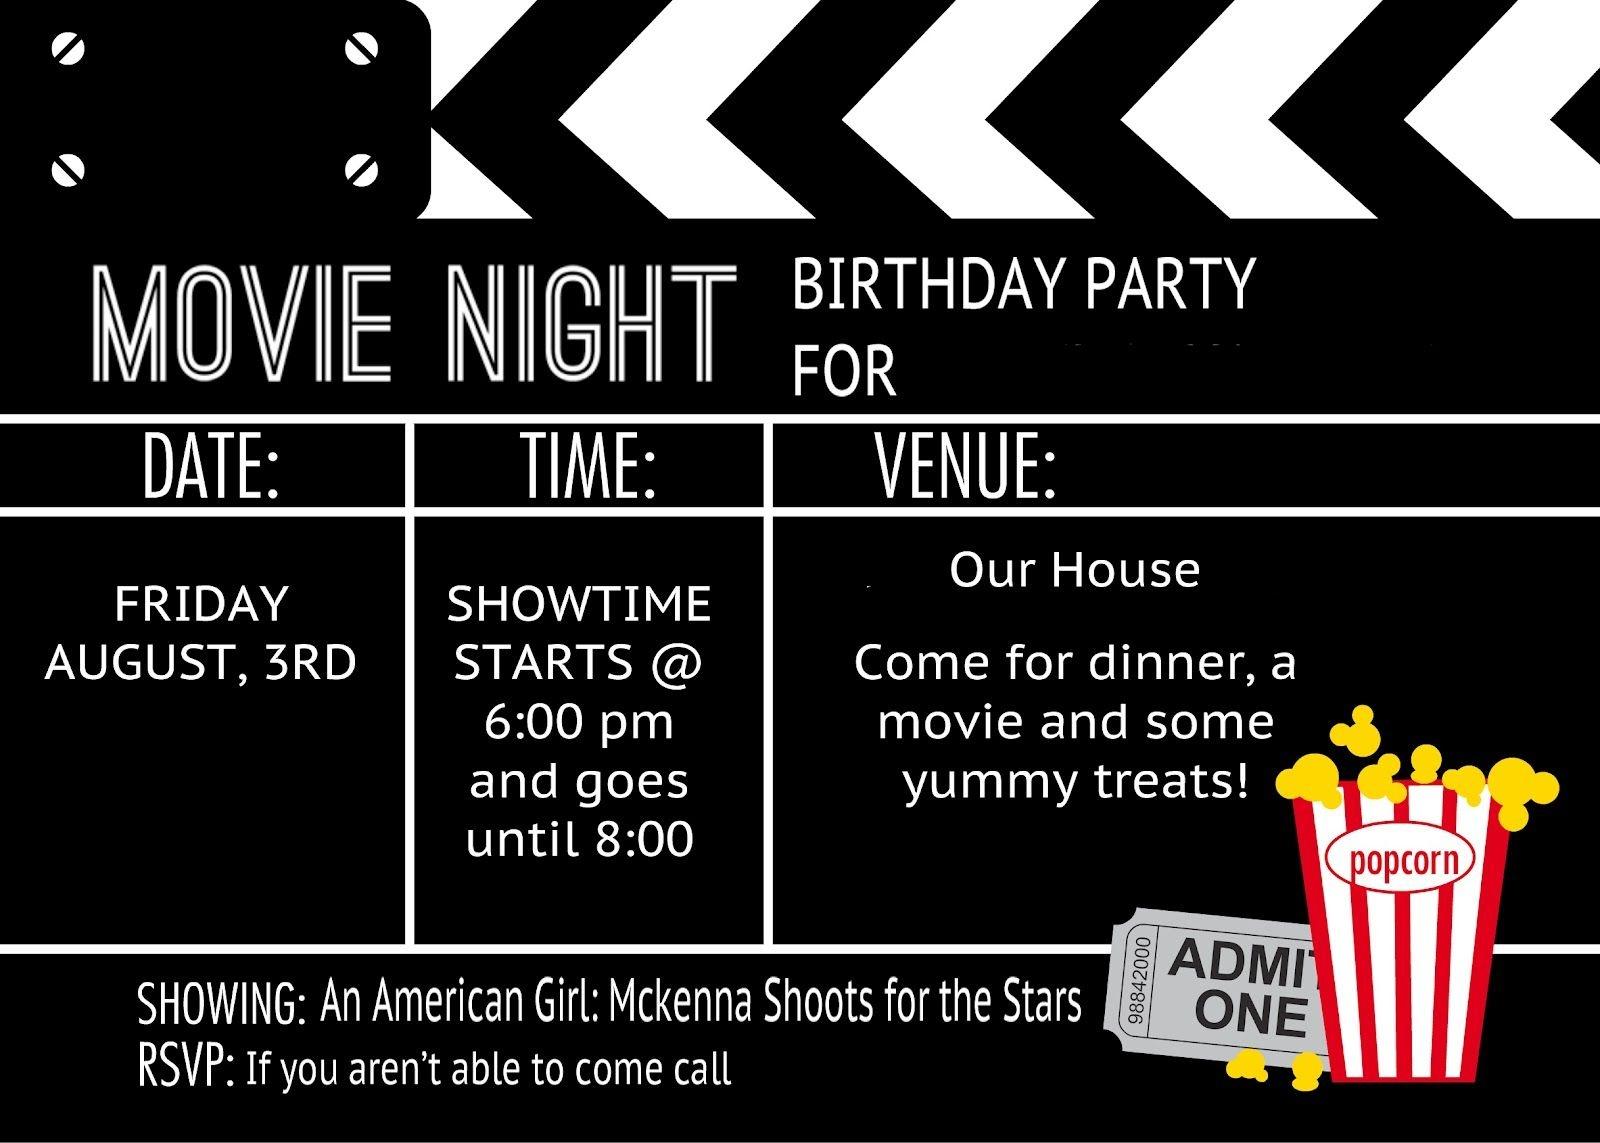 Birthday Party Invitation Templates Movie Theme | Kalli's 13Th - Free Printable Movie Ticket Birthday Party Invitations